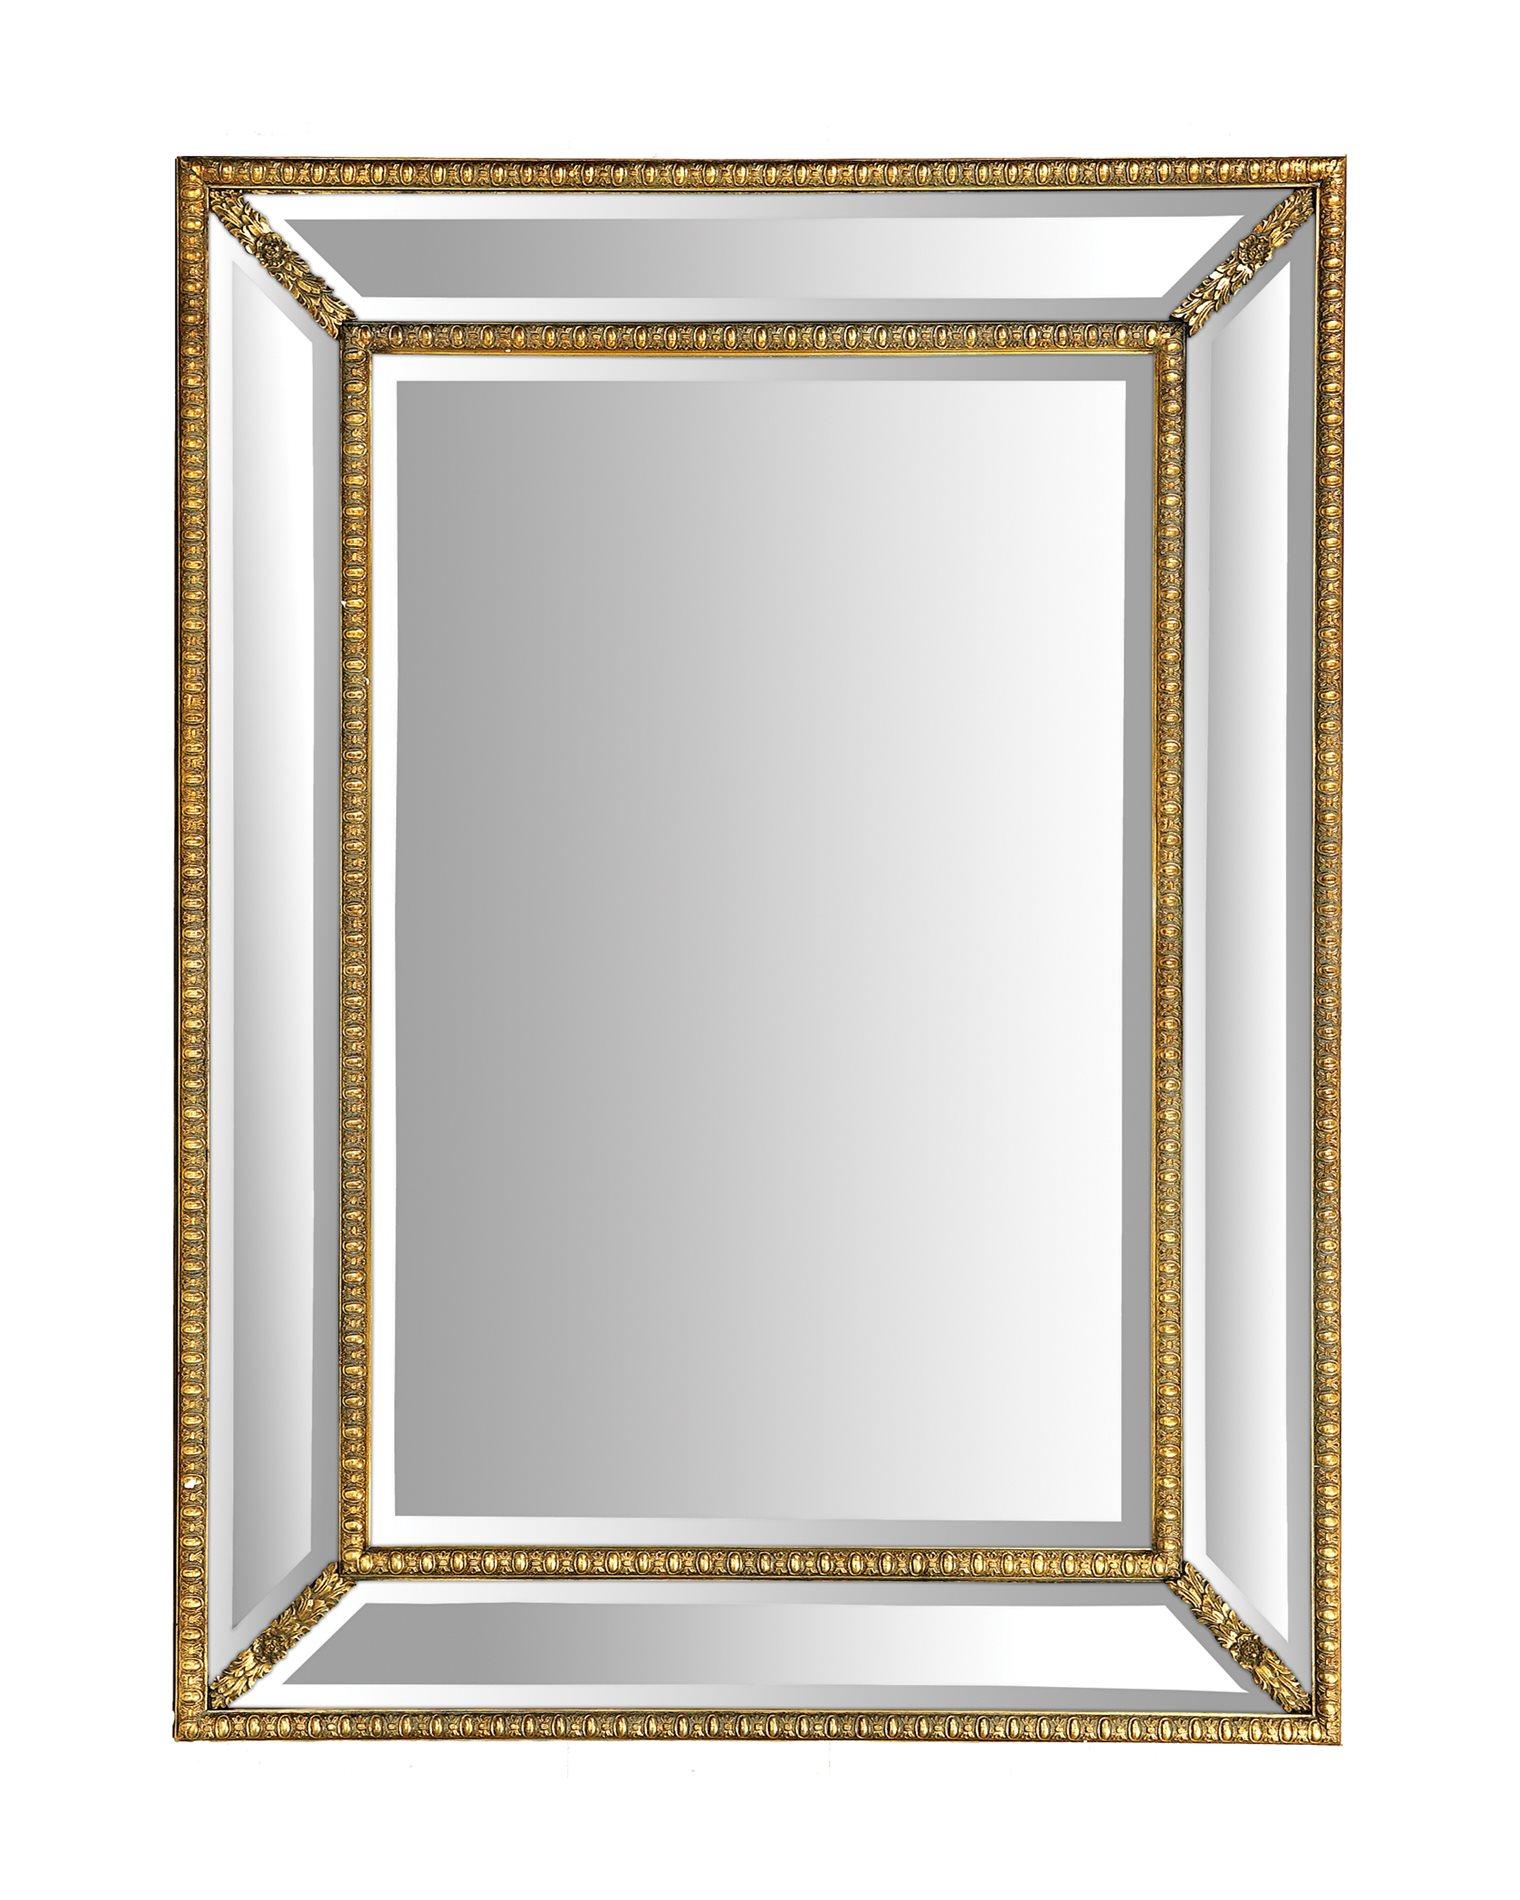 Beverly Foyer Mirror : Sterling industries m beverly foyer mirror sti